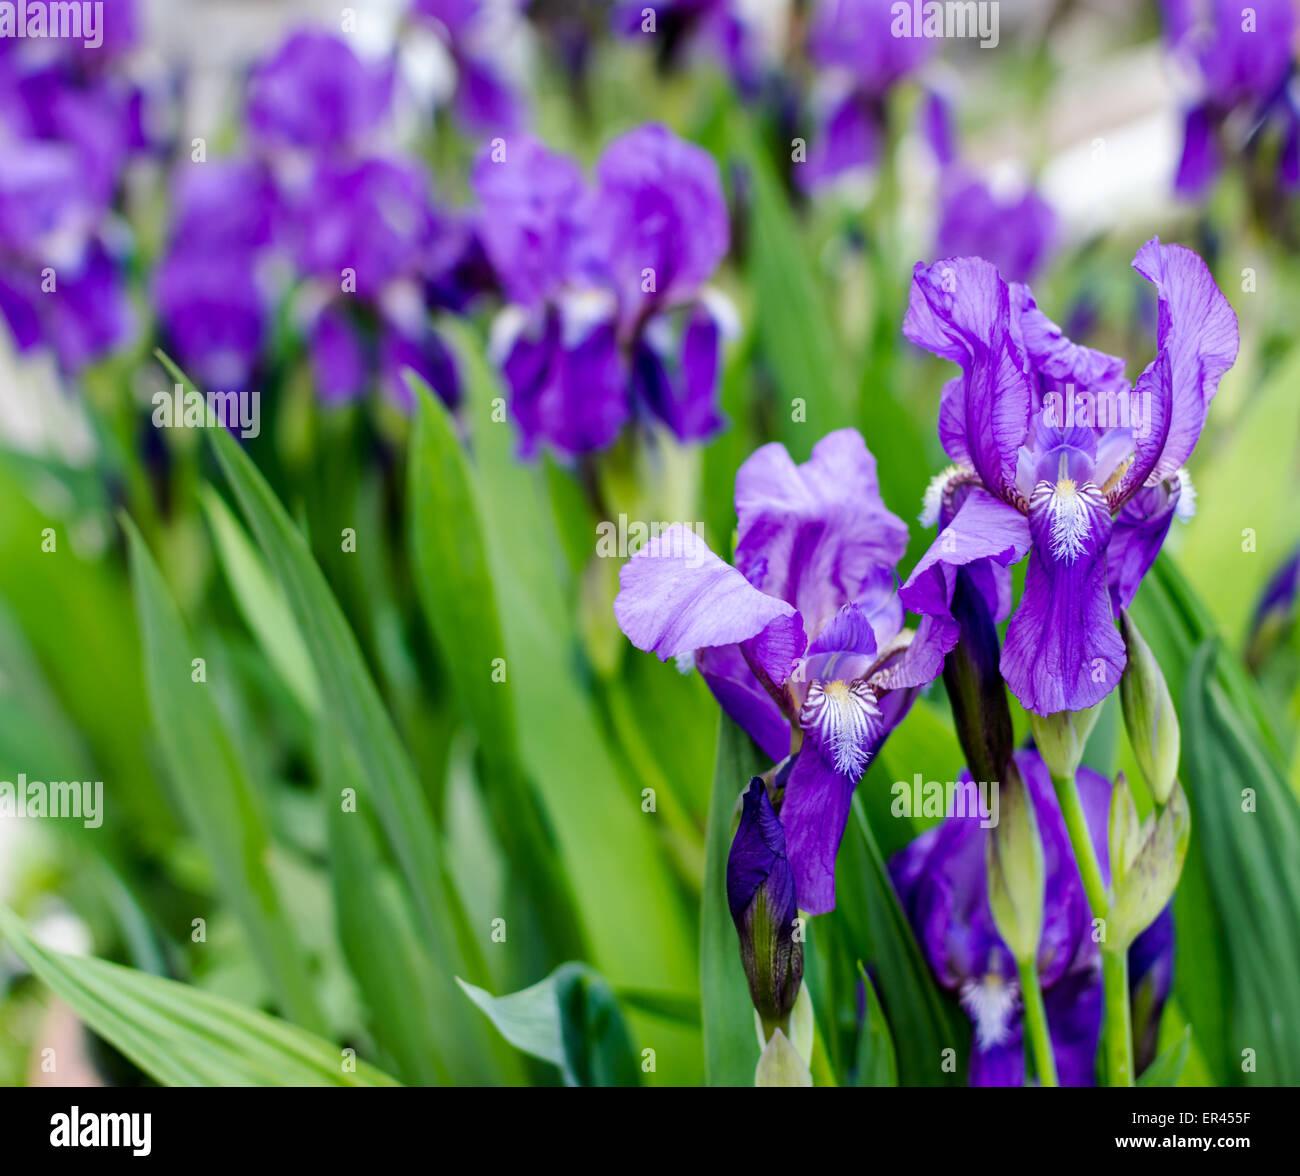 Bunch of iris flowers in full springtime bloom stock photo royalty bunch of iris flowers in full springtime bloom izmirmasajfo Image collections